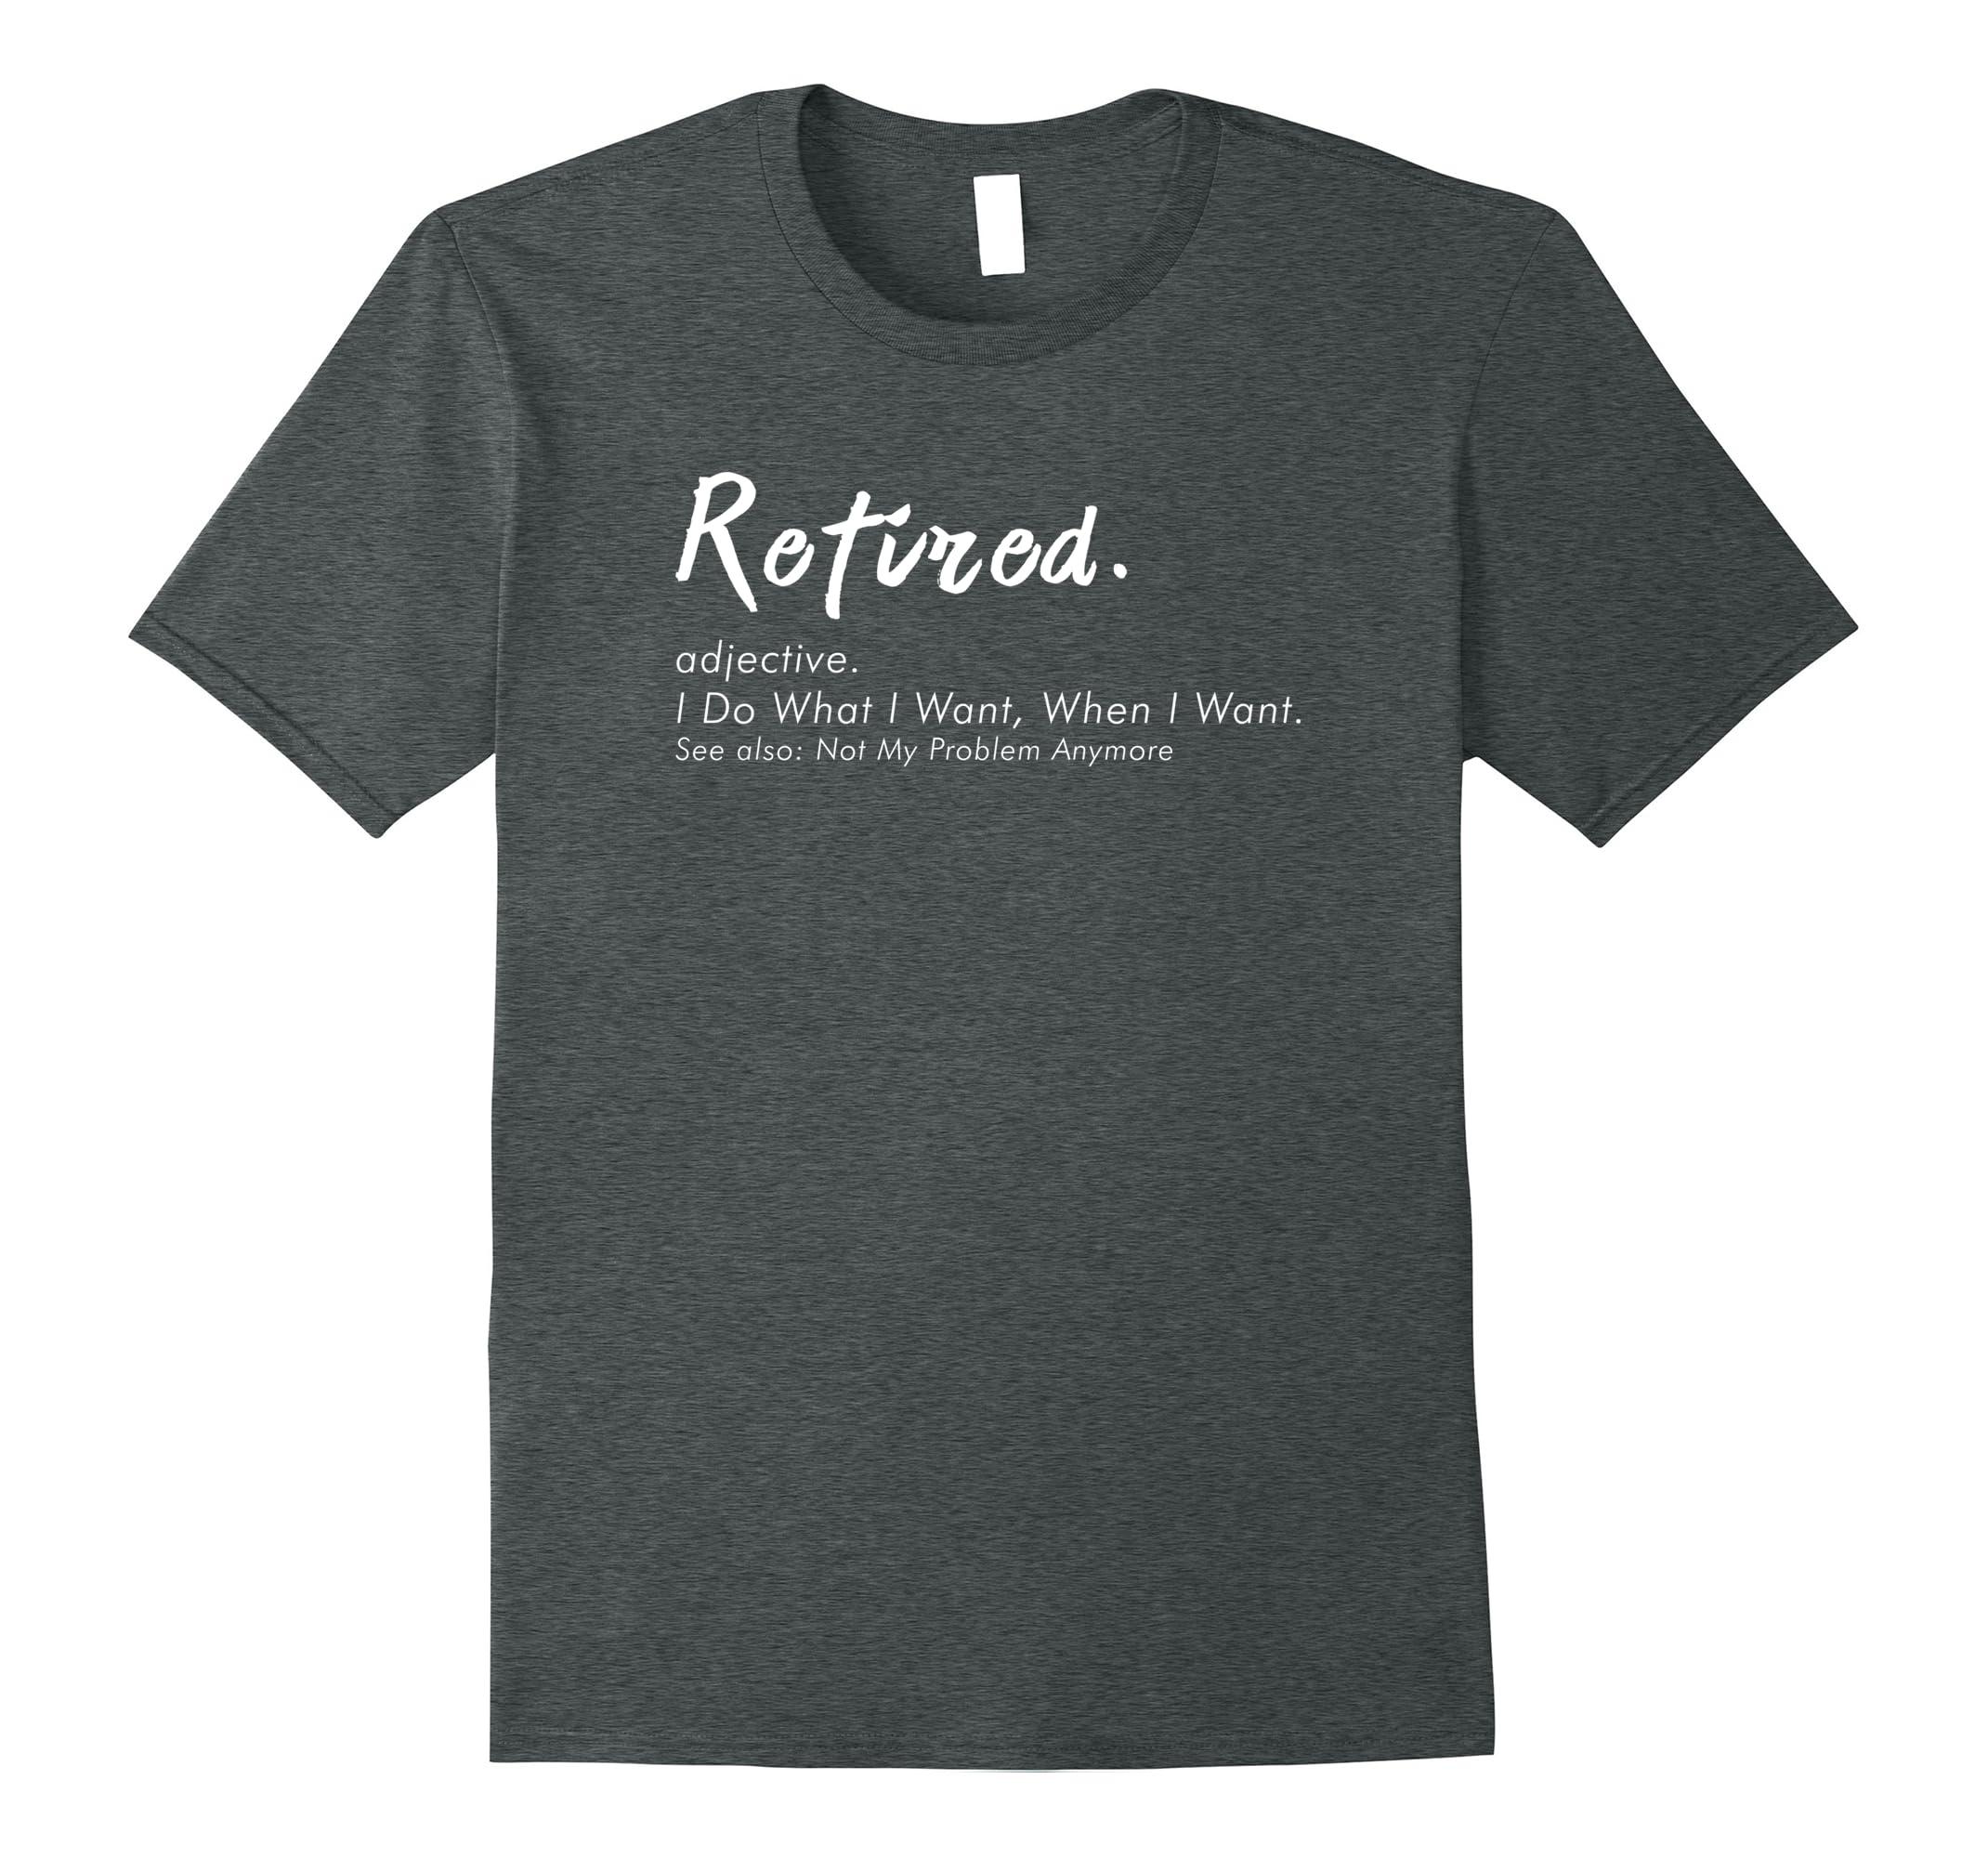 903df2e9 Retired Definition T-Shirt, Funny Retirement Gag Gifts-RT – Rateeshirt